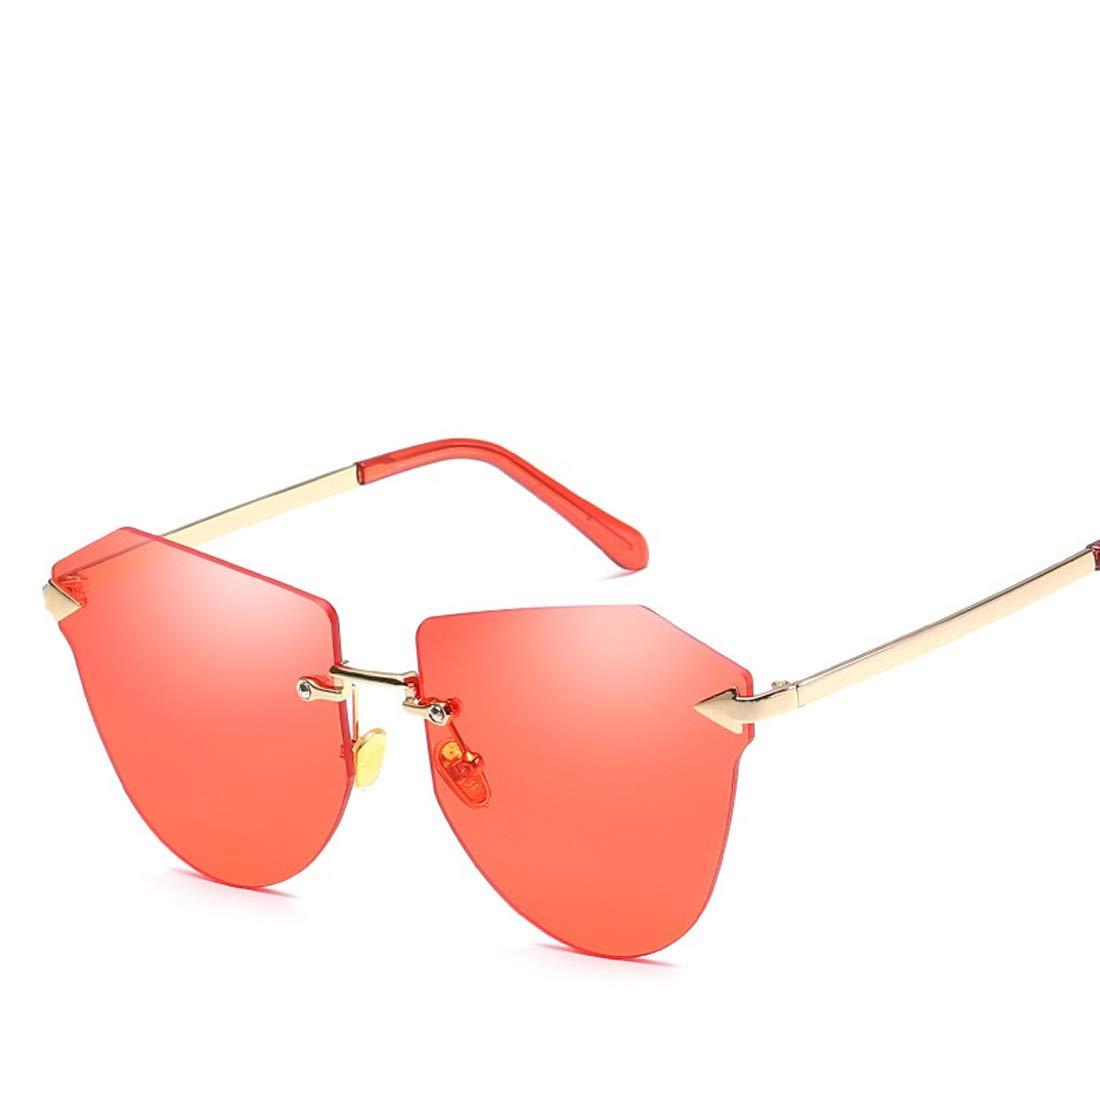 Wsunglass New fashions high definition color ocean sunglasses men ladies general sunglasses fashion sunglasses